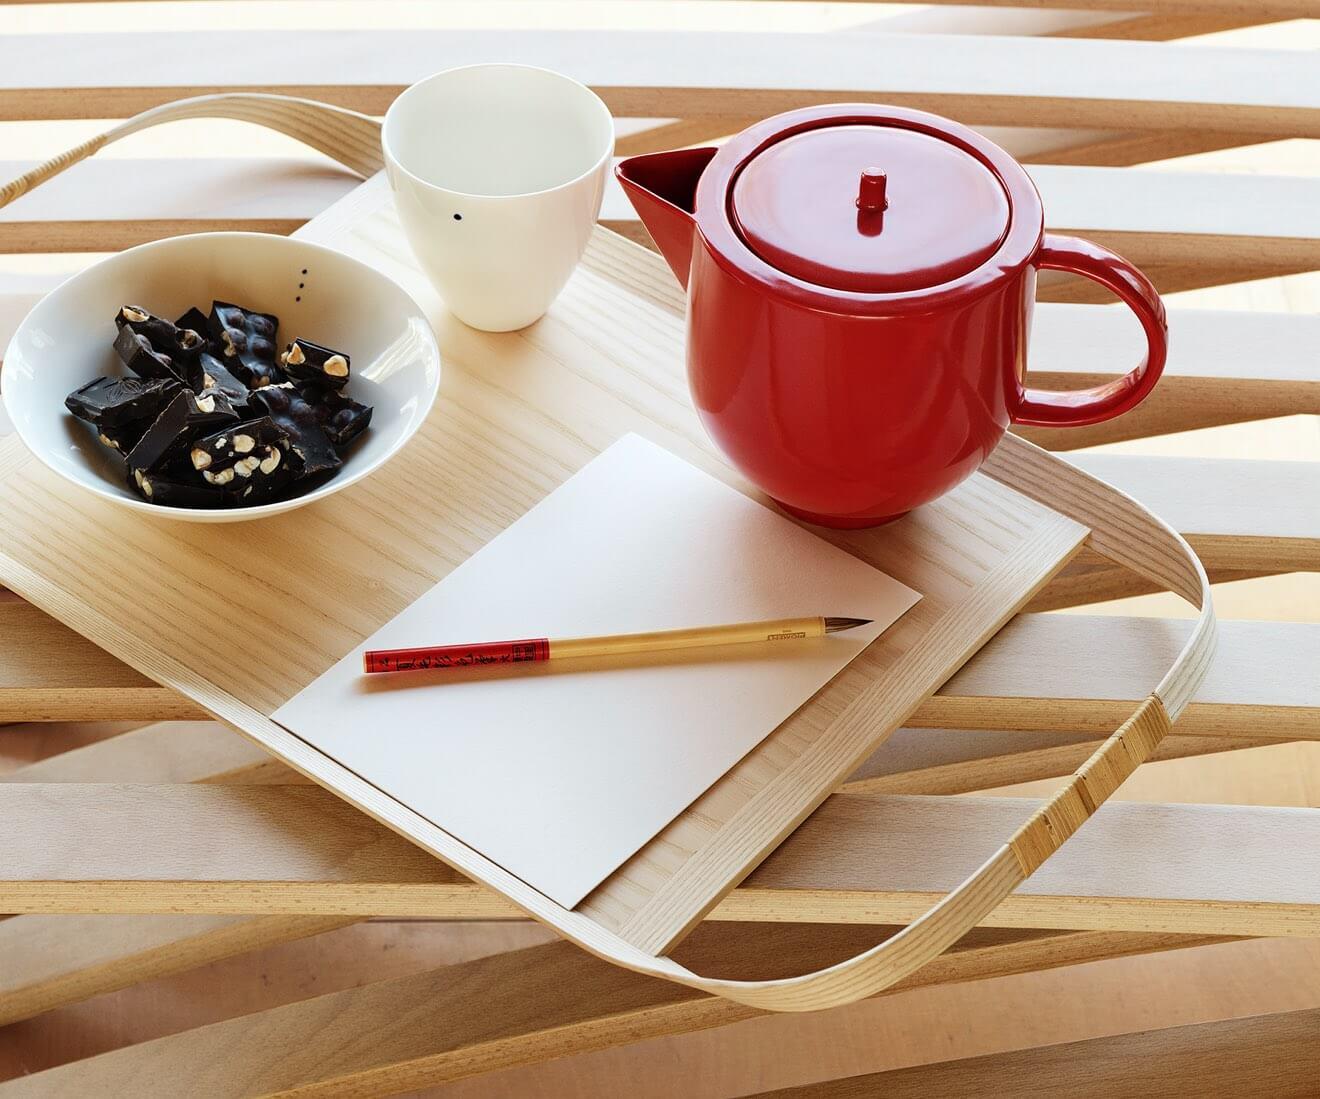 Interior photo of Motarasu designs - Union tray by Masuko Unayama - Shiro bowls and Yoko tea pot Red by Stilleben - Jundo daybed by Mads Emil Garde